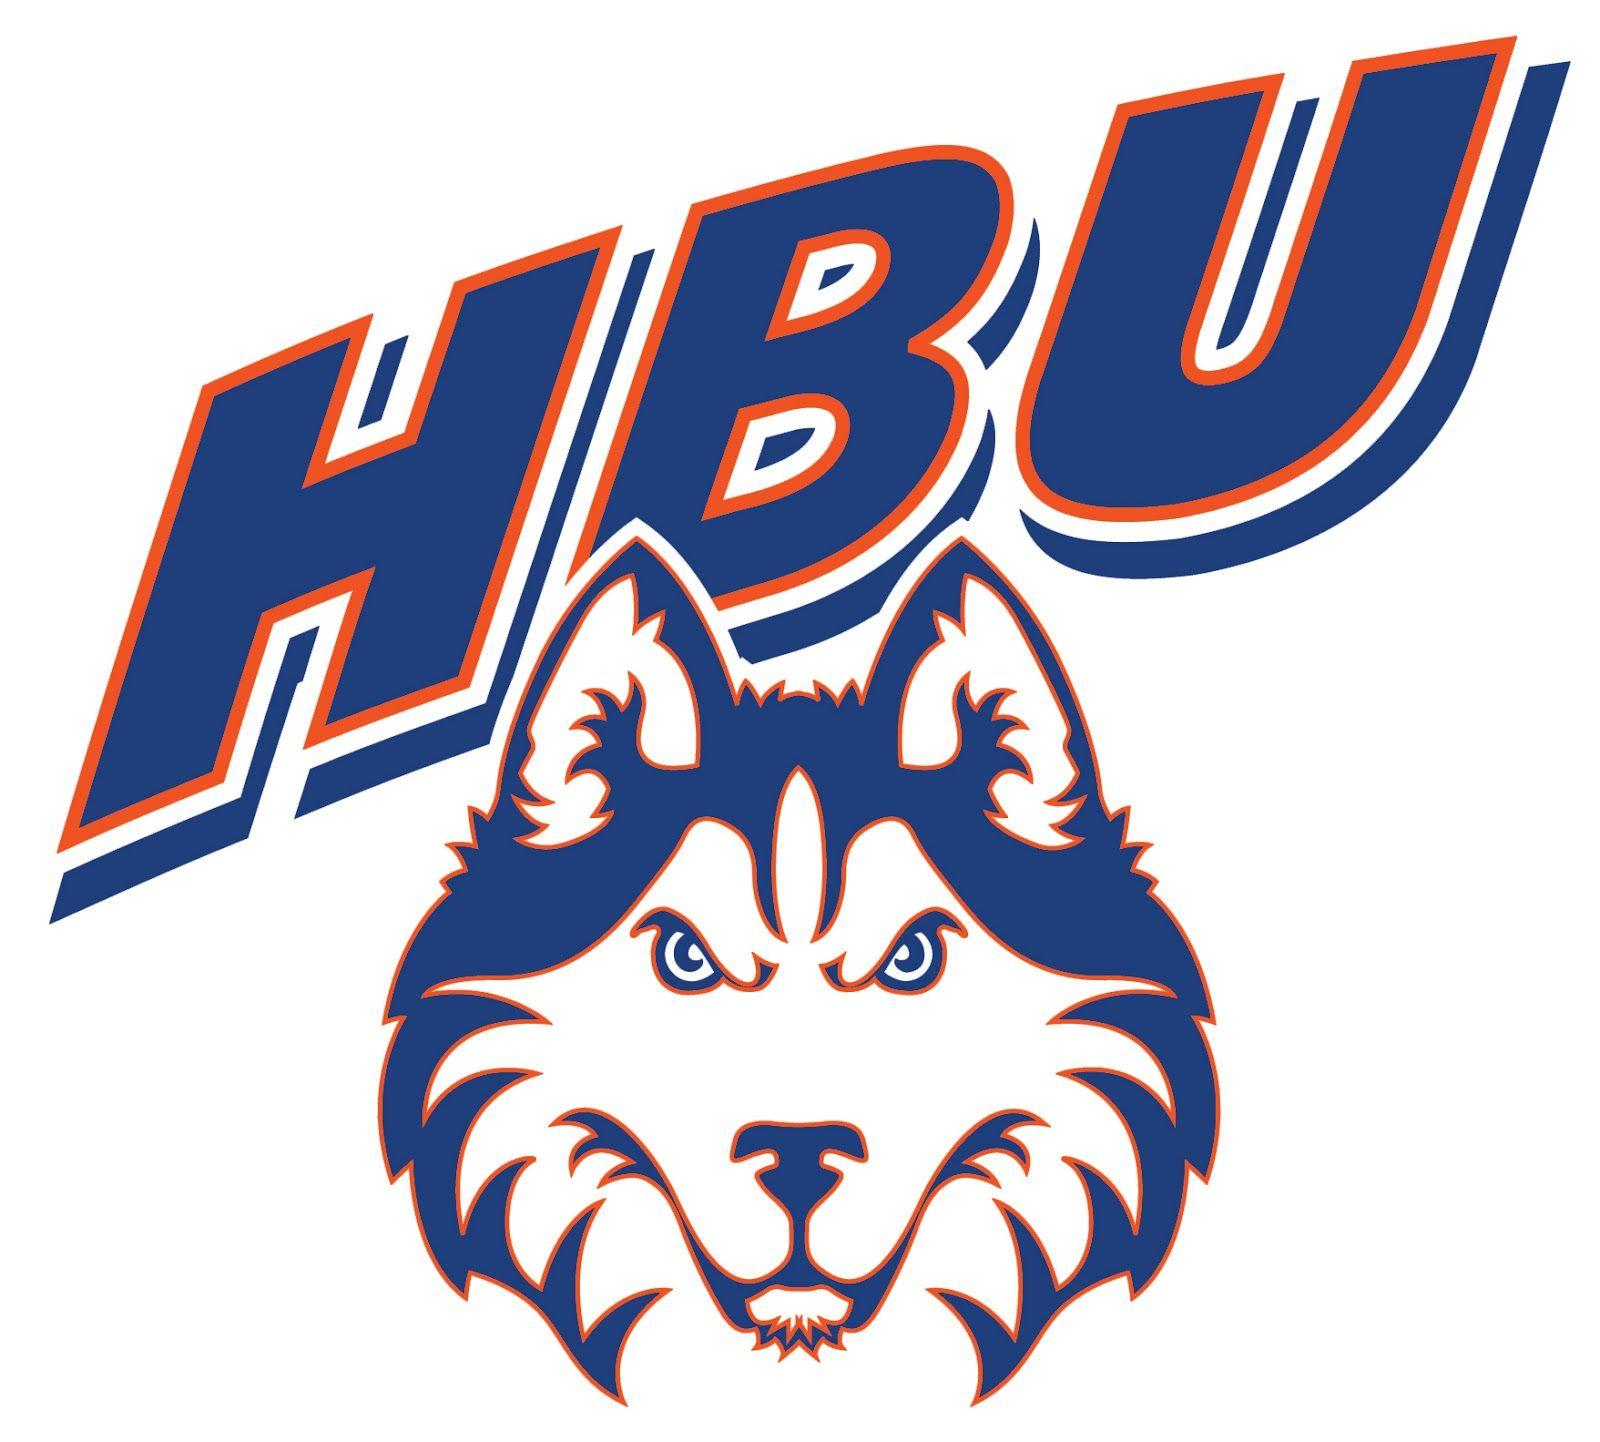 Houston Baptist Huskies Ncaa Division I Southland Conference Houston Texas Husky Logo Logo Shapes Football Usa